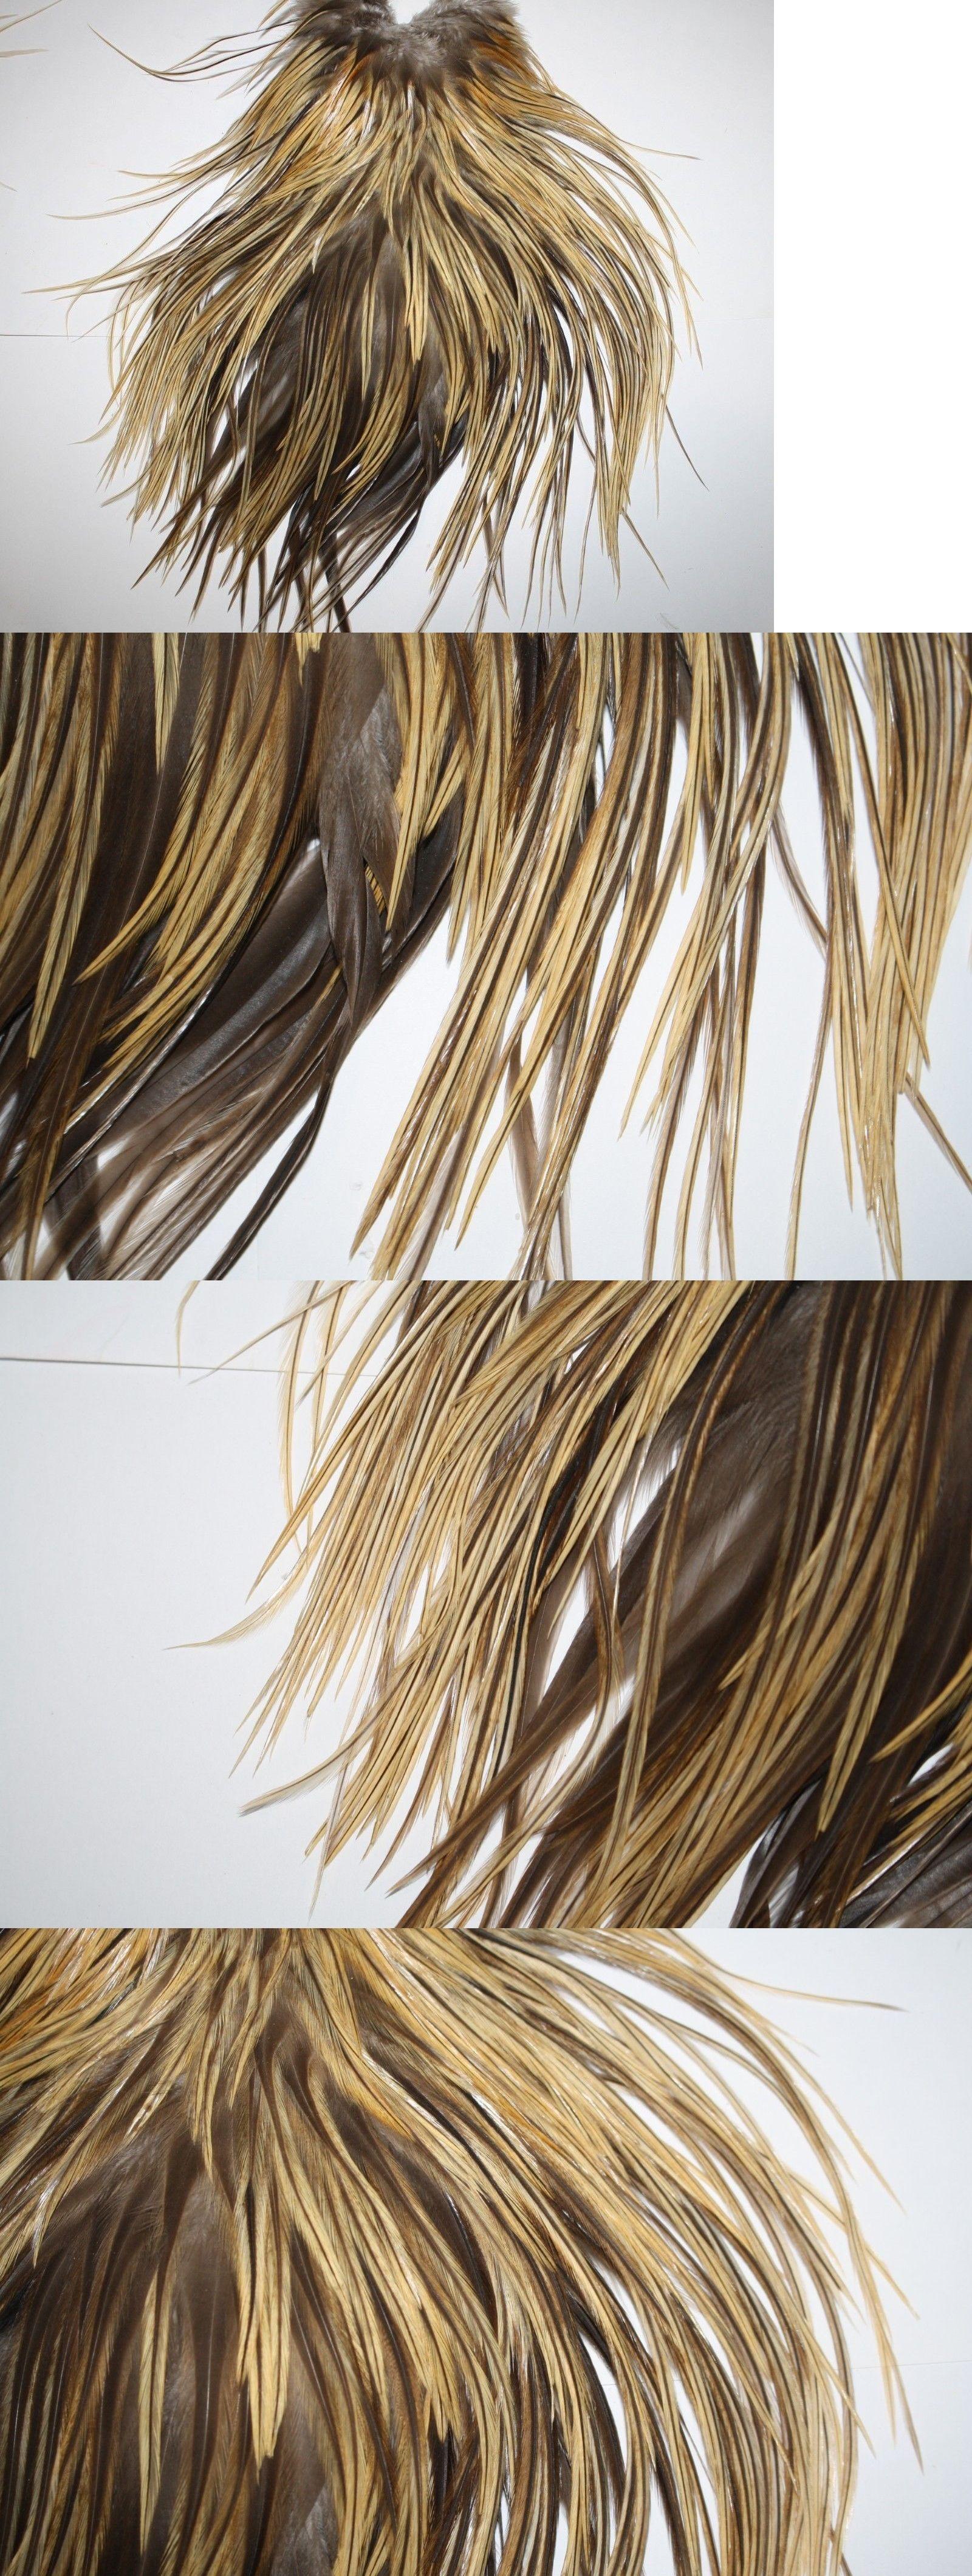 Angelsport-Fliegen-Bindematerialien Angelsport-Köder, -Futtermittel & -Fliegen Fly Tying Whiting Gold Rooster Saddle Light Ginger #C